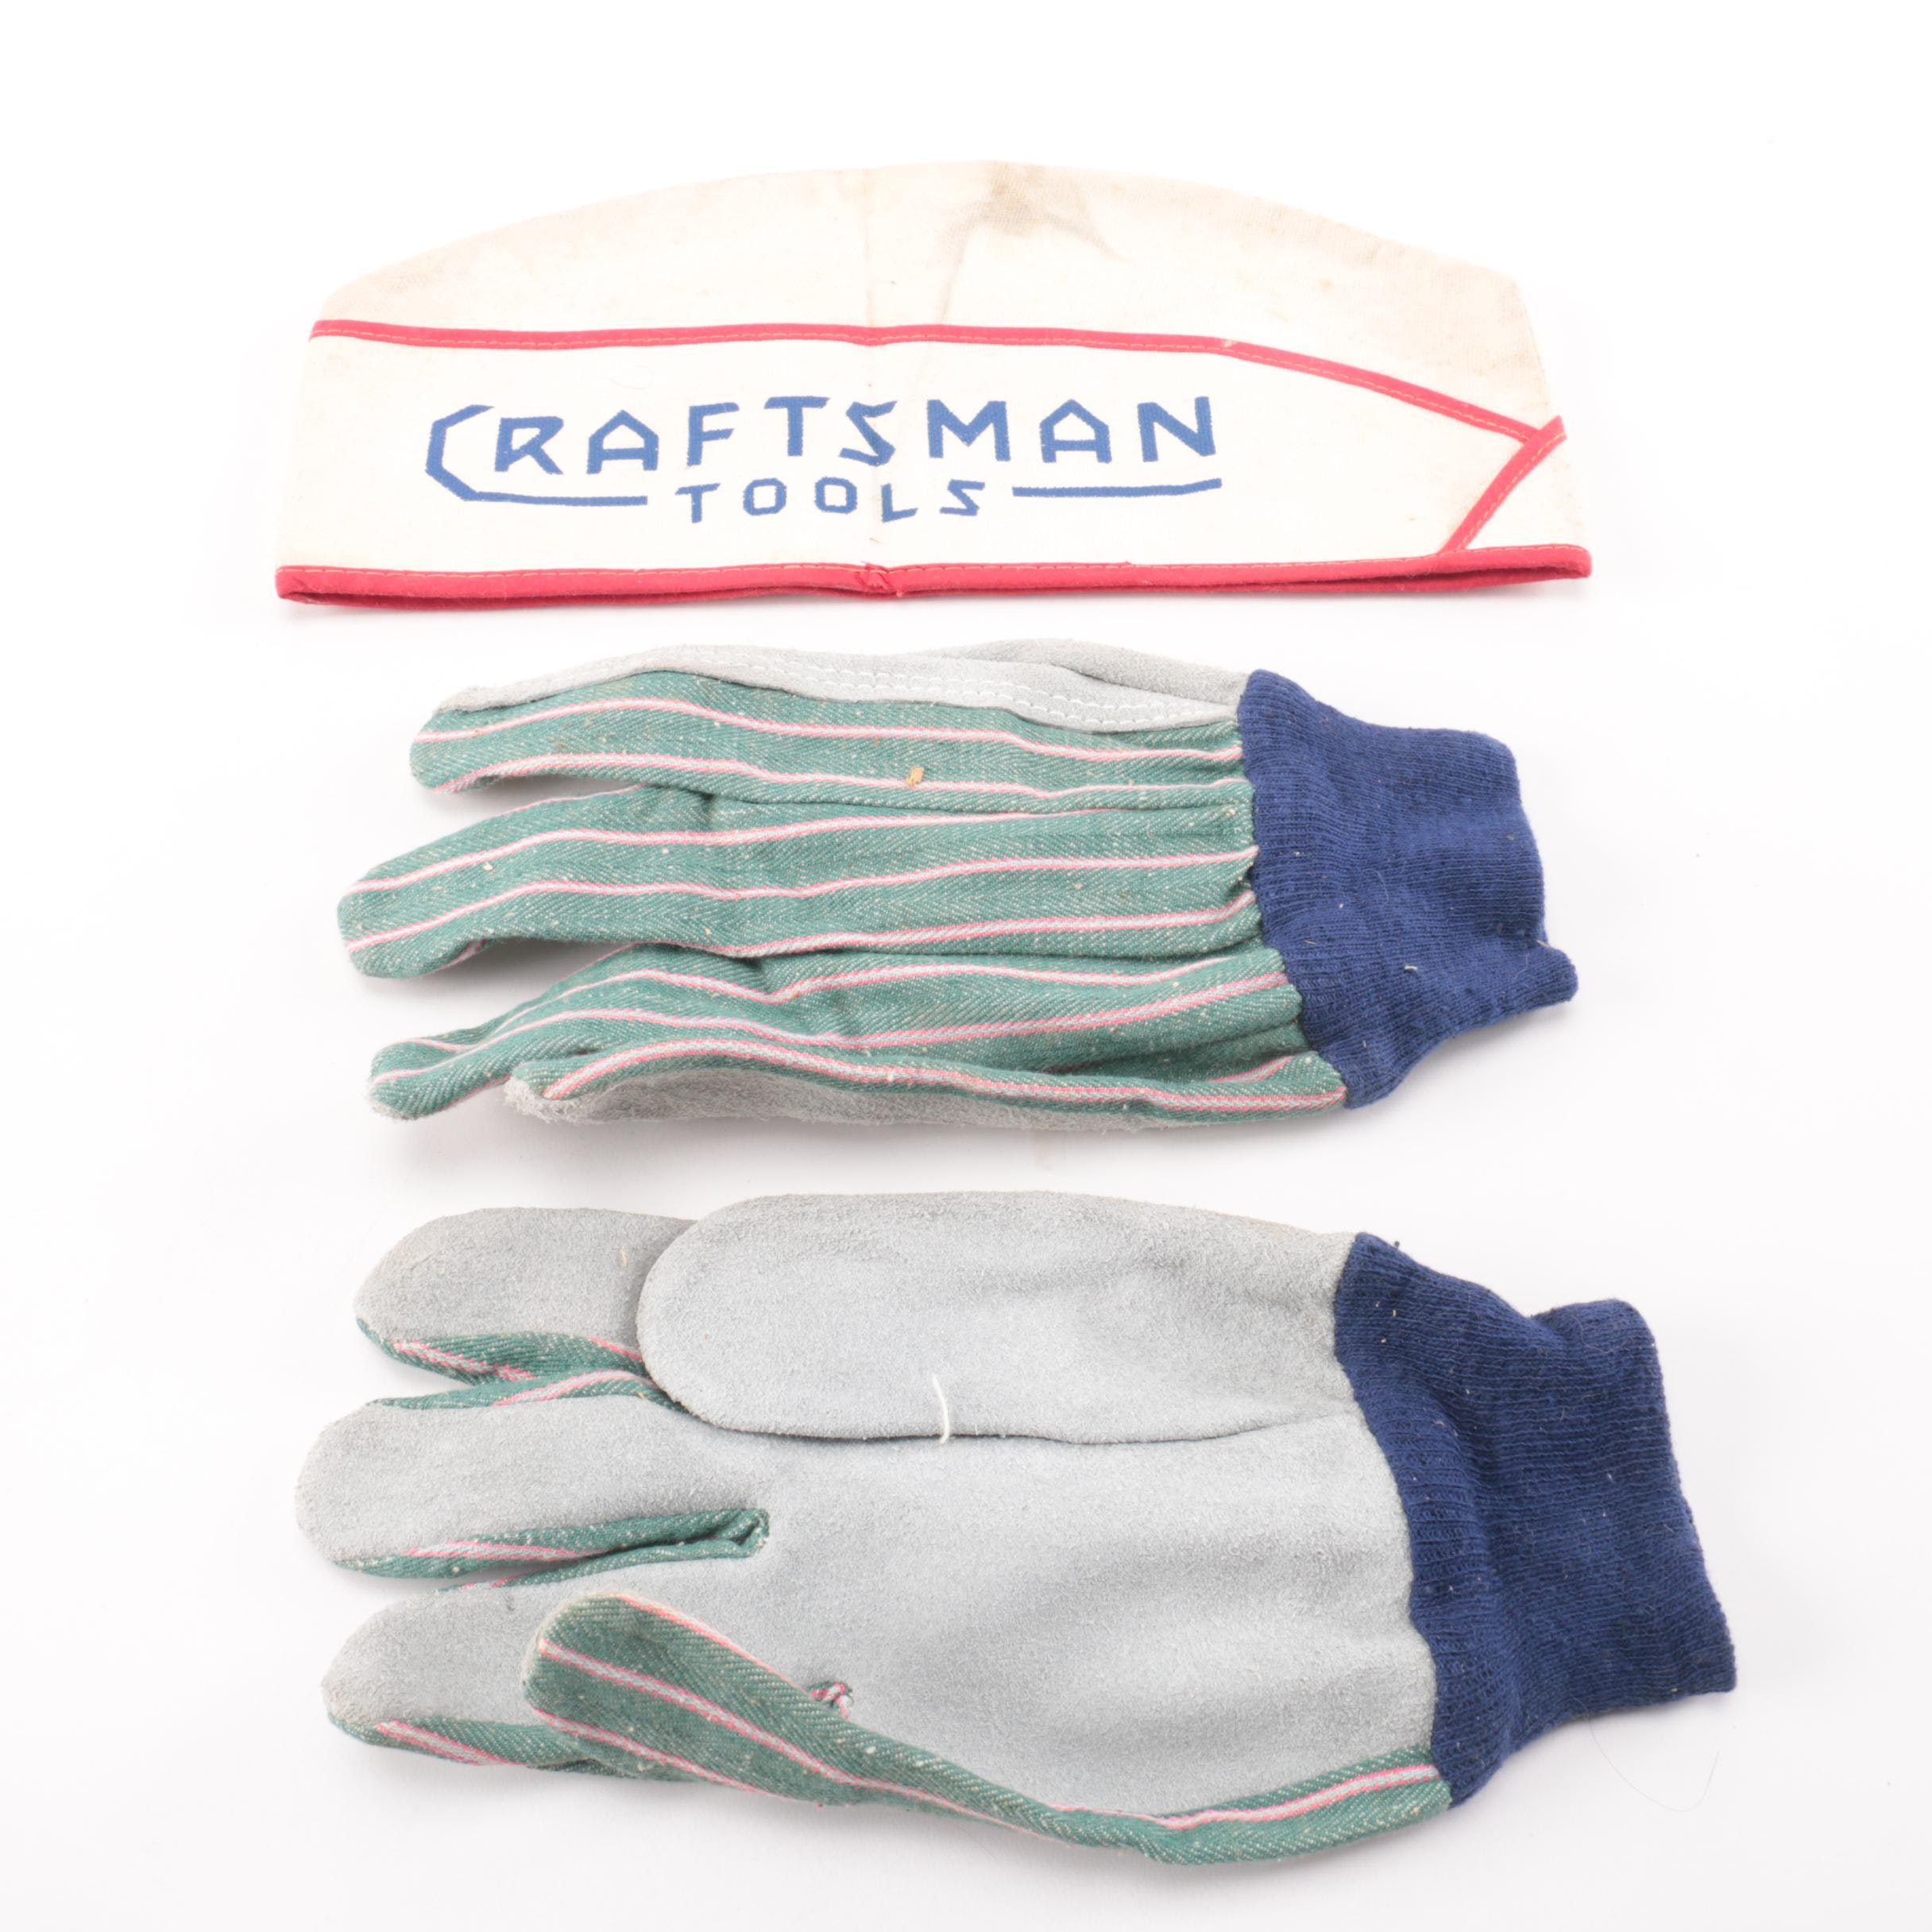 Pair of Work Gloves and Craftsman Tool Bag